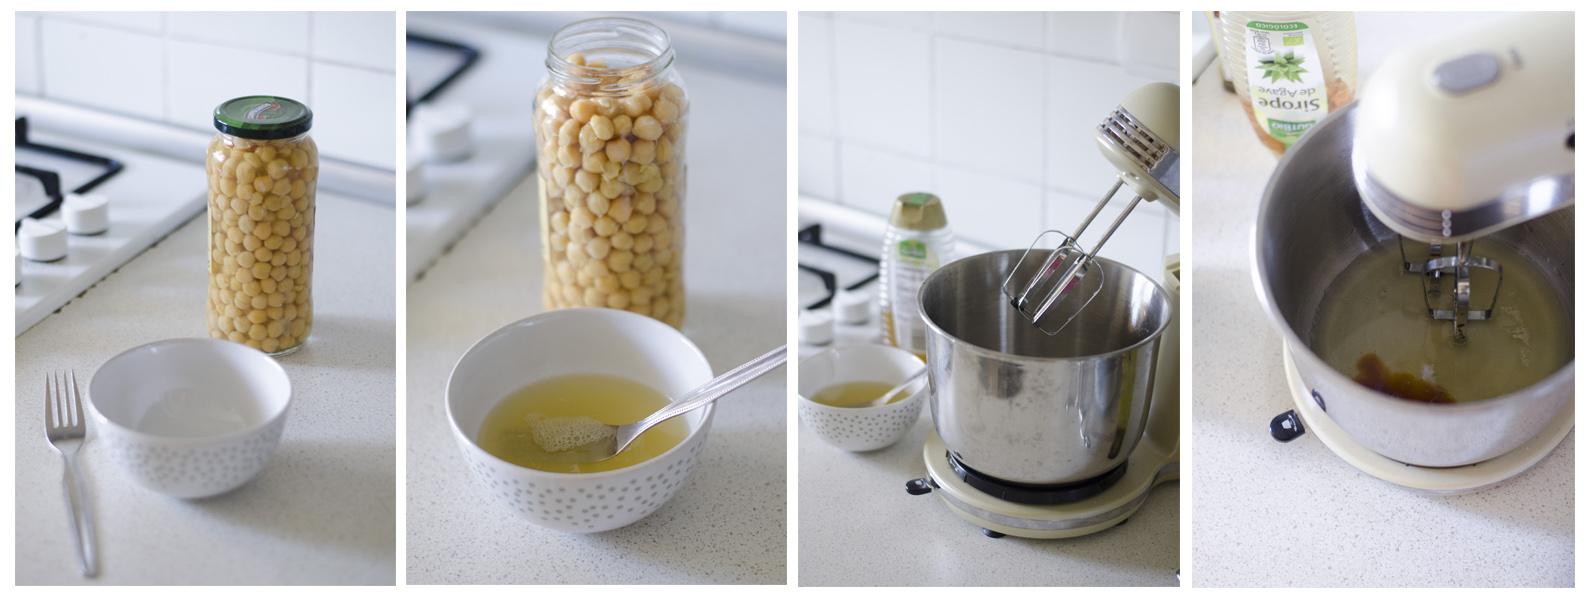 "La ""nata"" o ""merengue"" vegano se puede hacer a partir de Aquafaba."